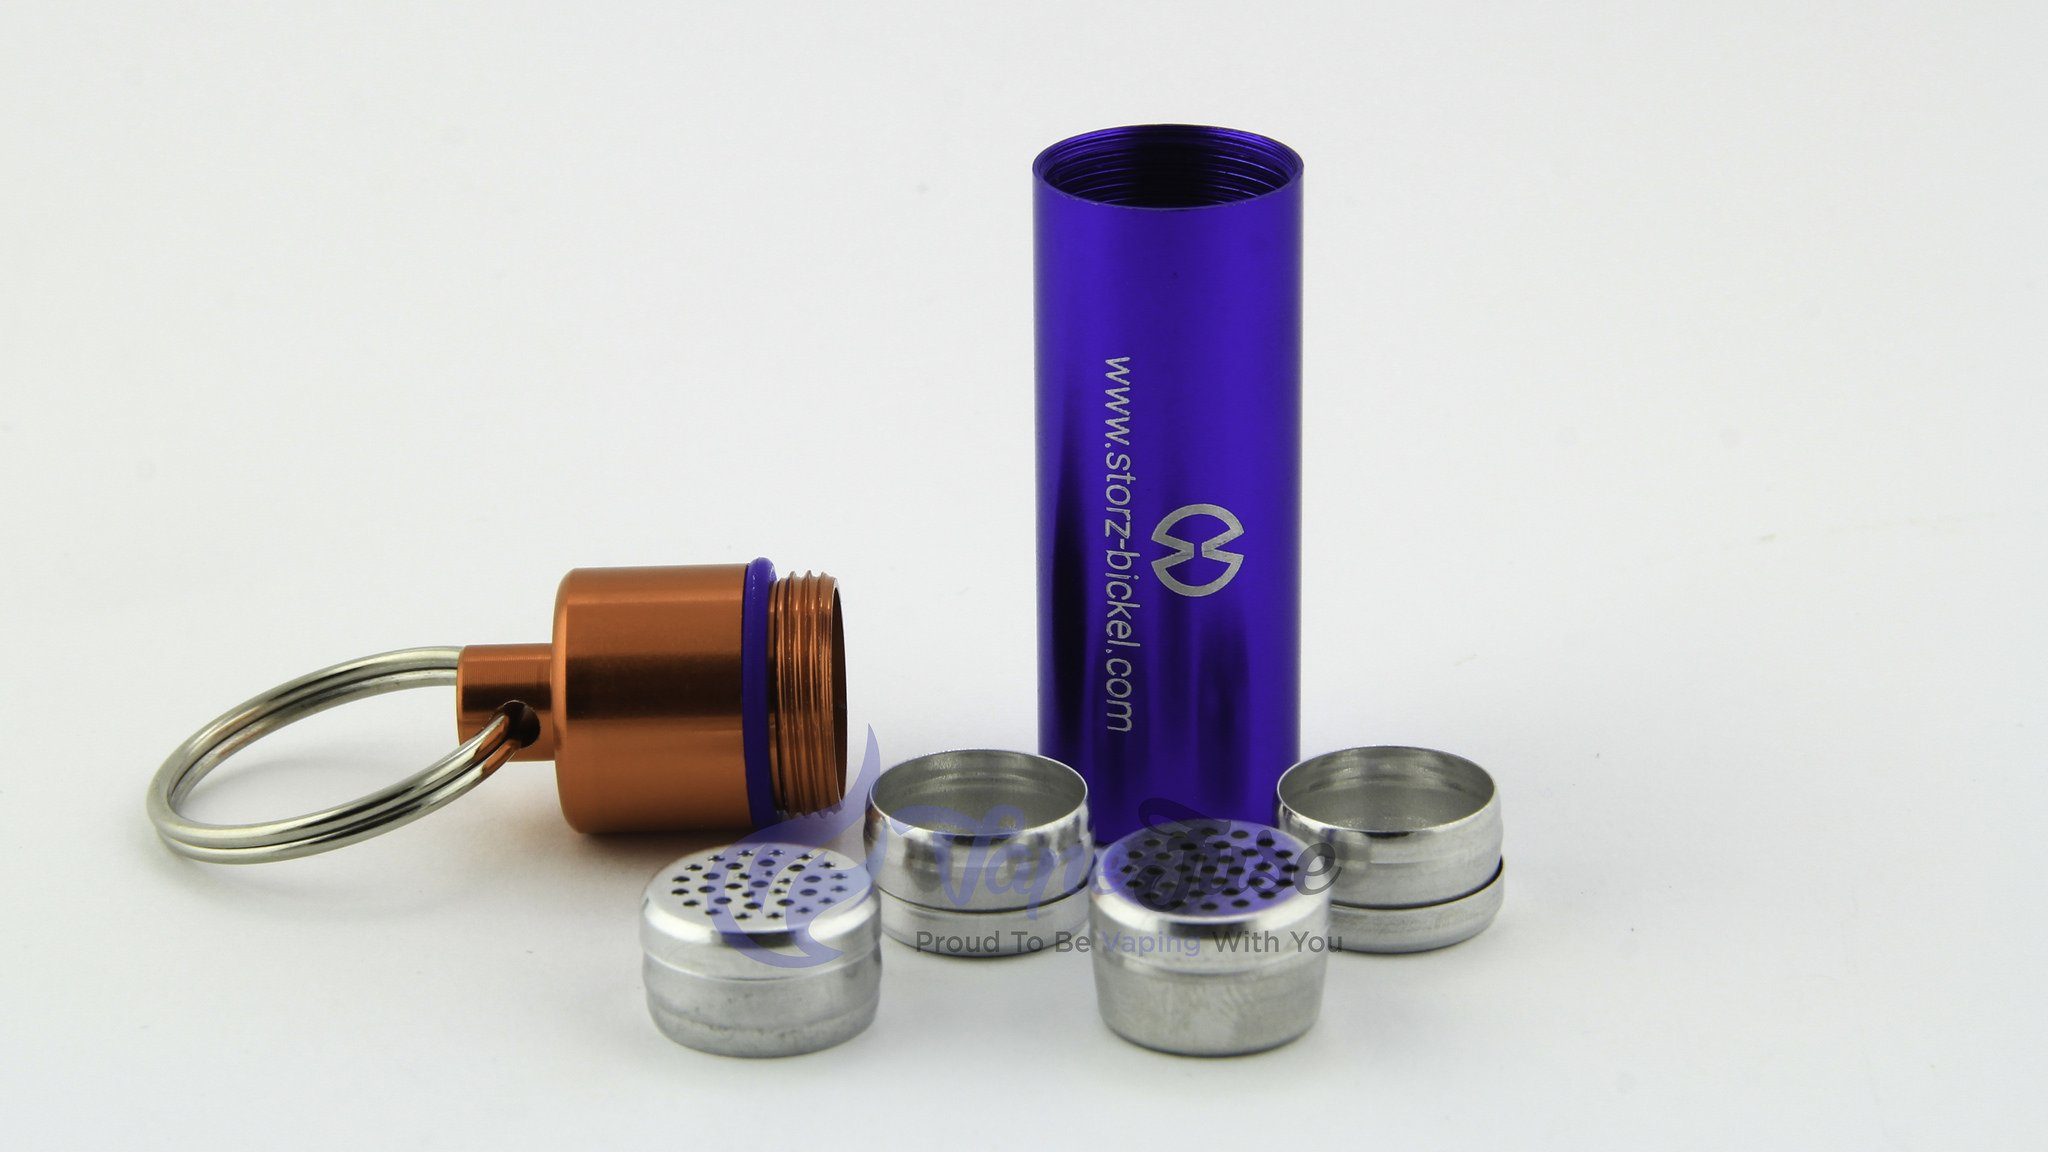 S&B Mighty Vaporizer - dosing capsules